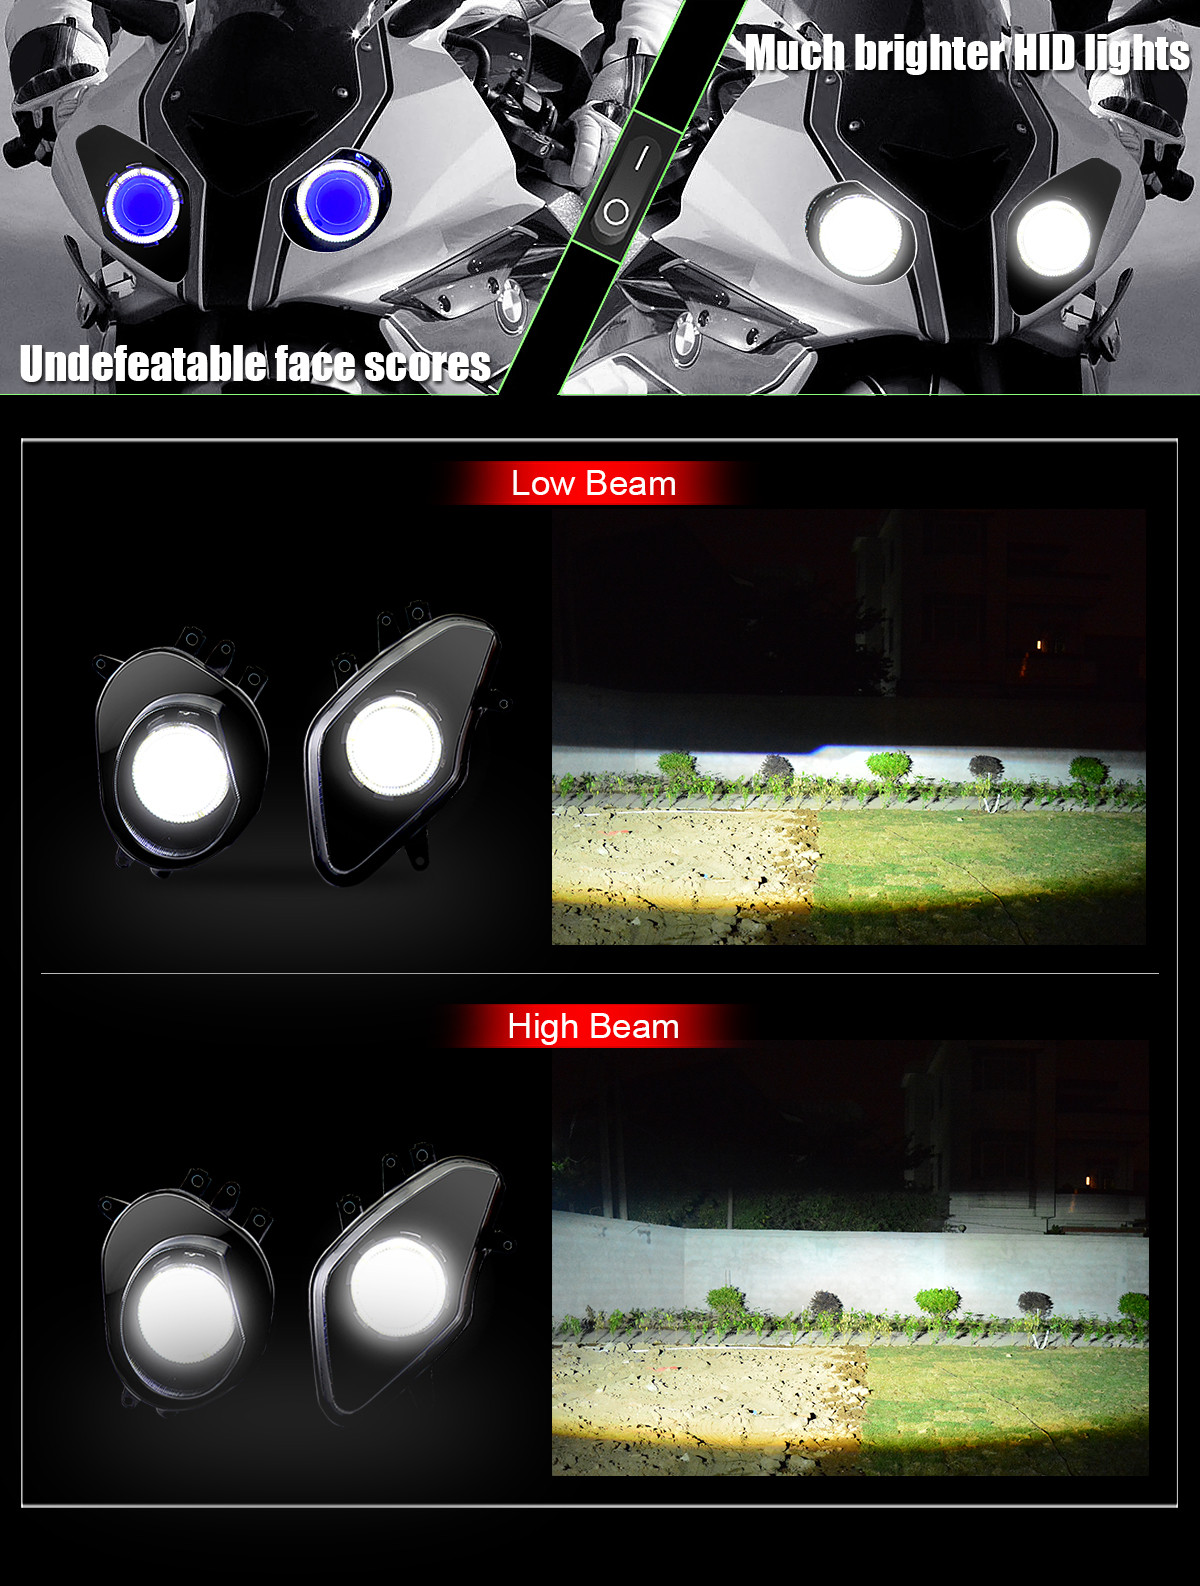 2013 2014 BMW HP4 headlight assembly